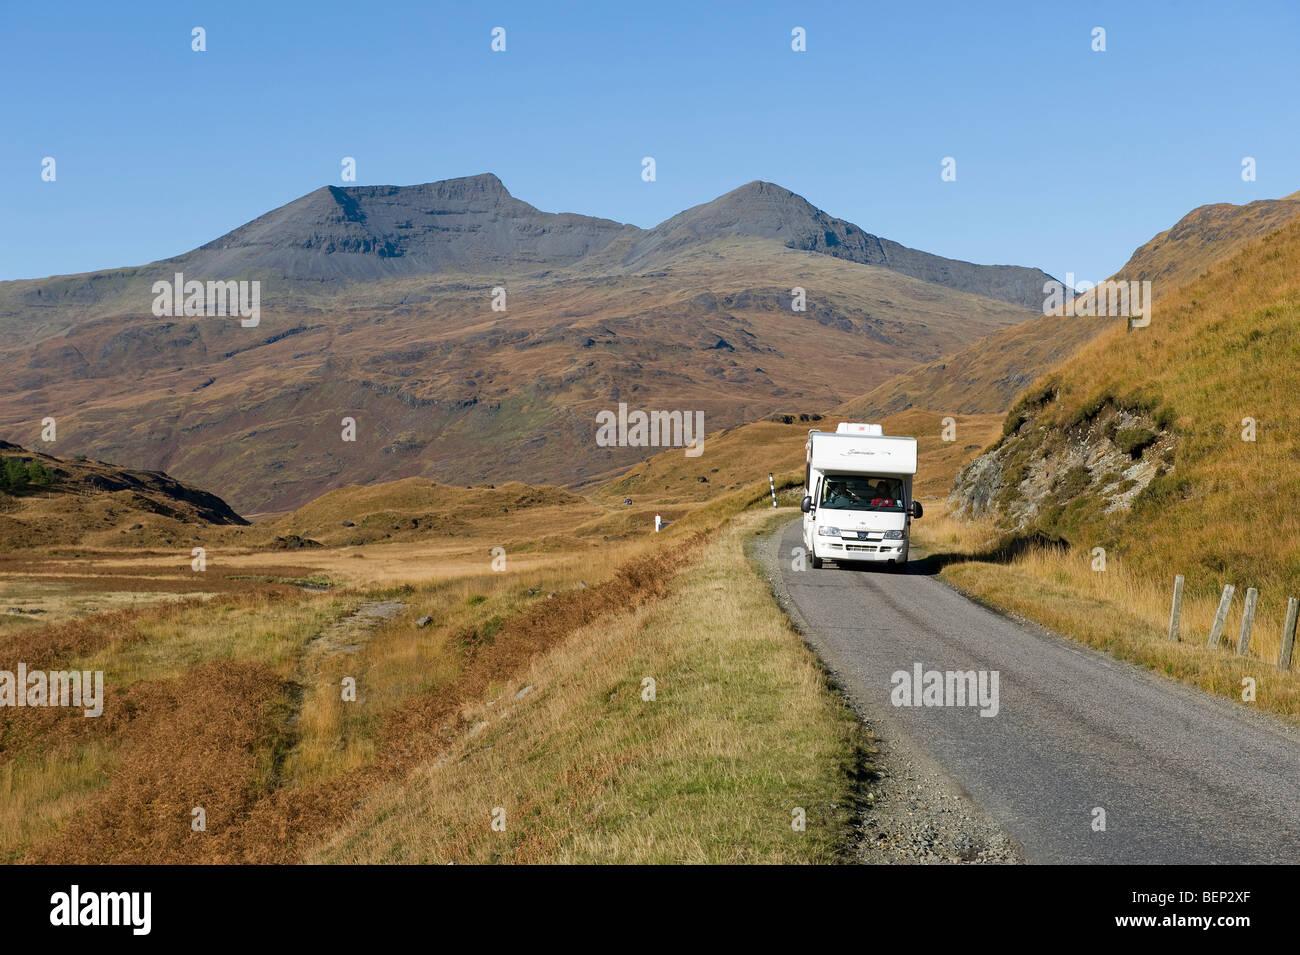 motorhome on road, glen more, isle of mull, scotland - Stock Image